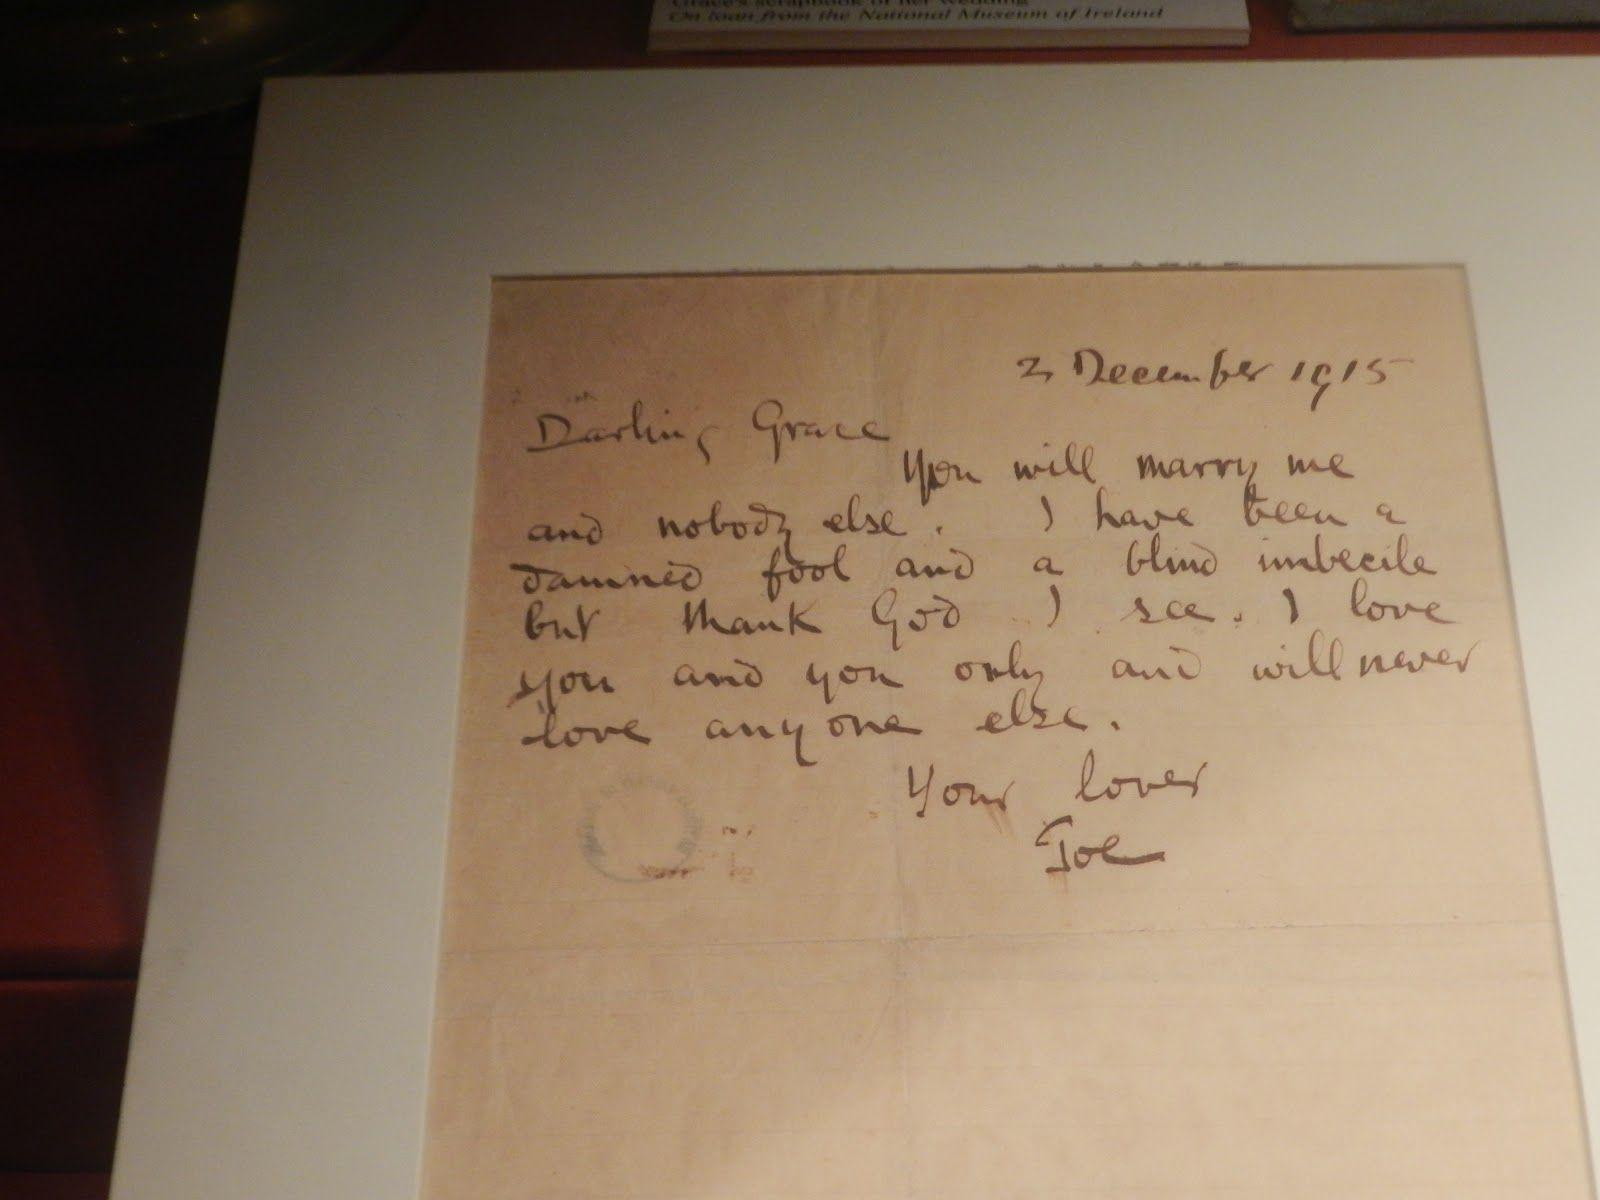 Kilmainham Gaol Joseph PlunkettS Love Letter To Grace Gifford